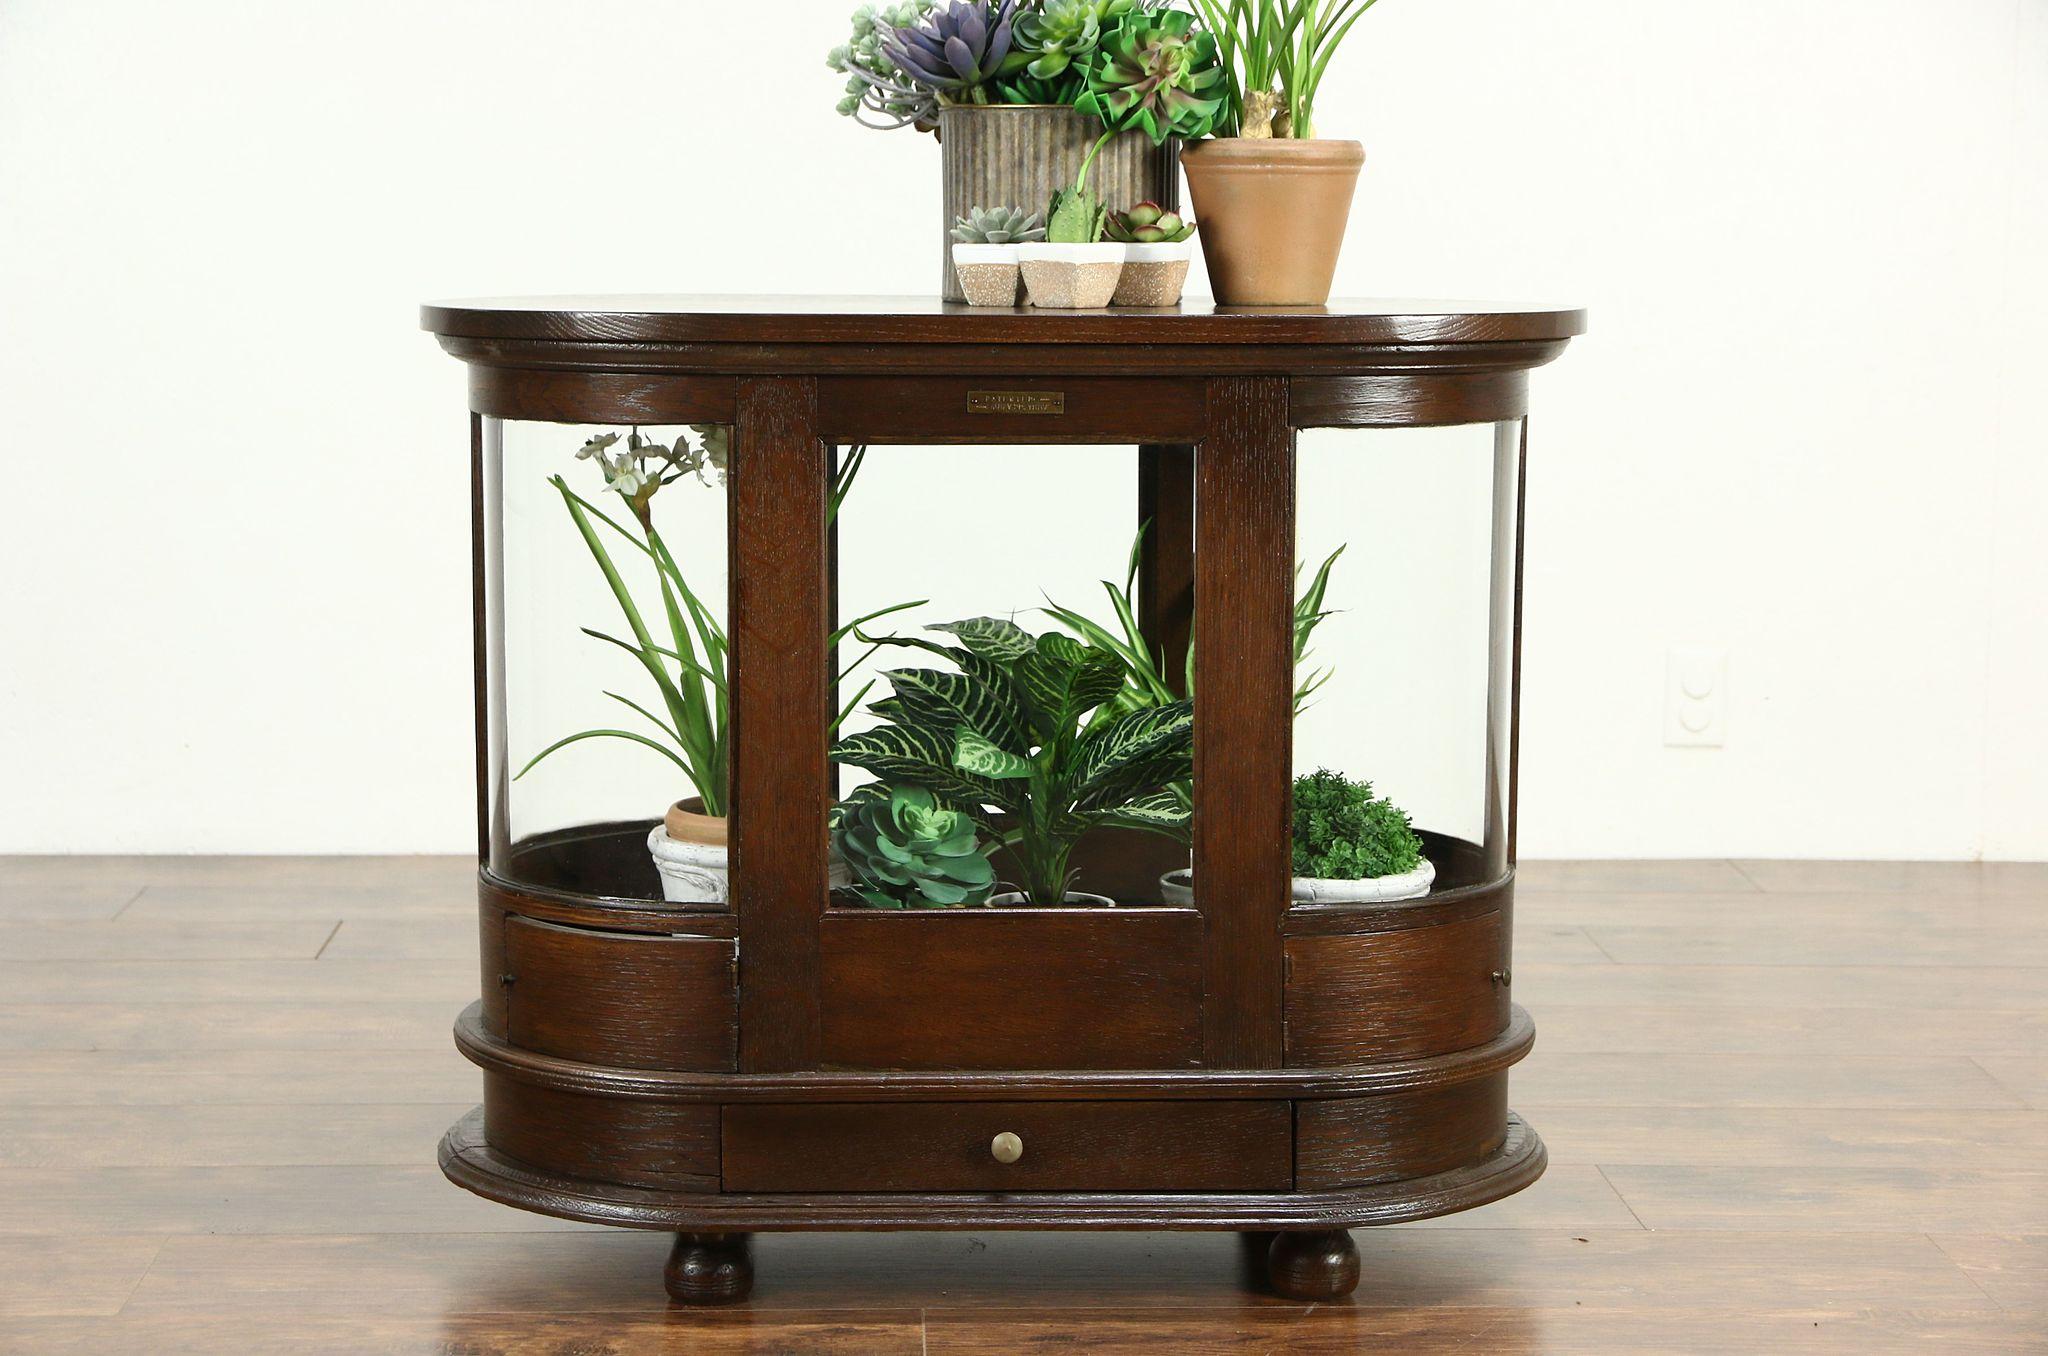 Merrick 1900 Antique Oak Spool Cabinet Converted To Tabletop Showcase ...